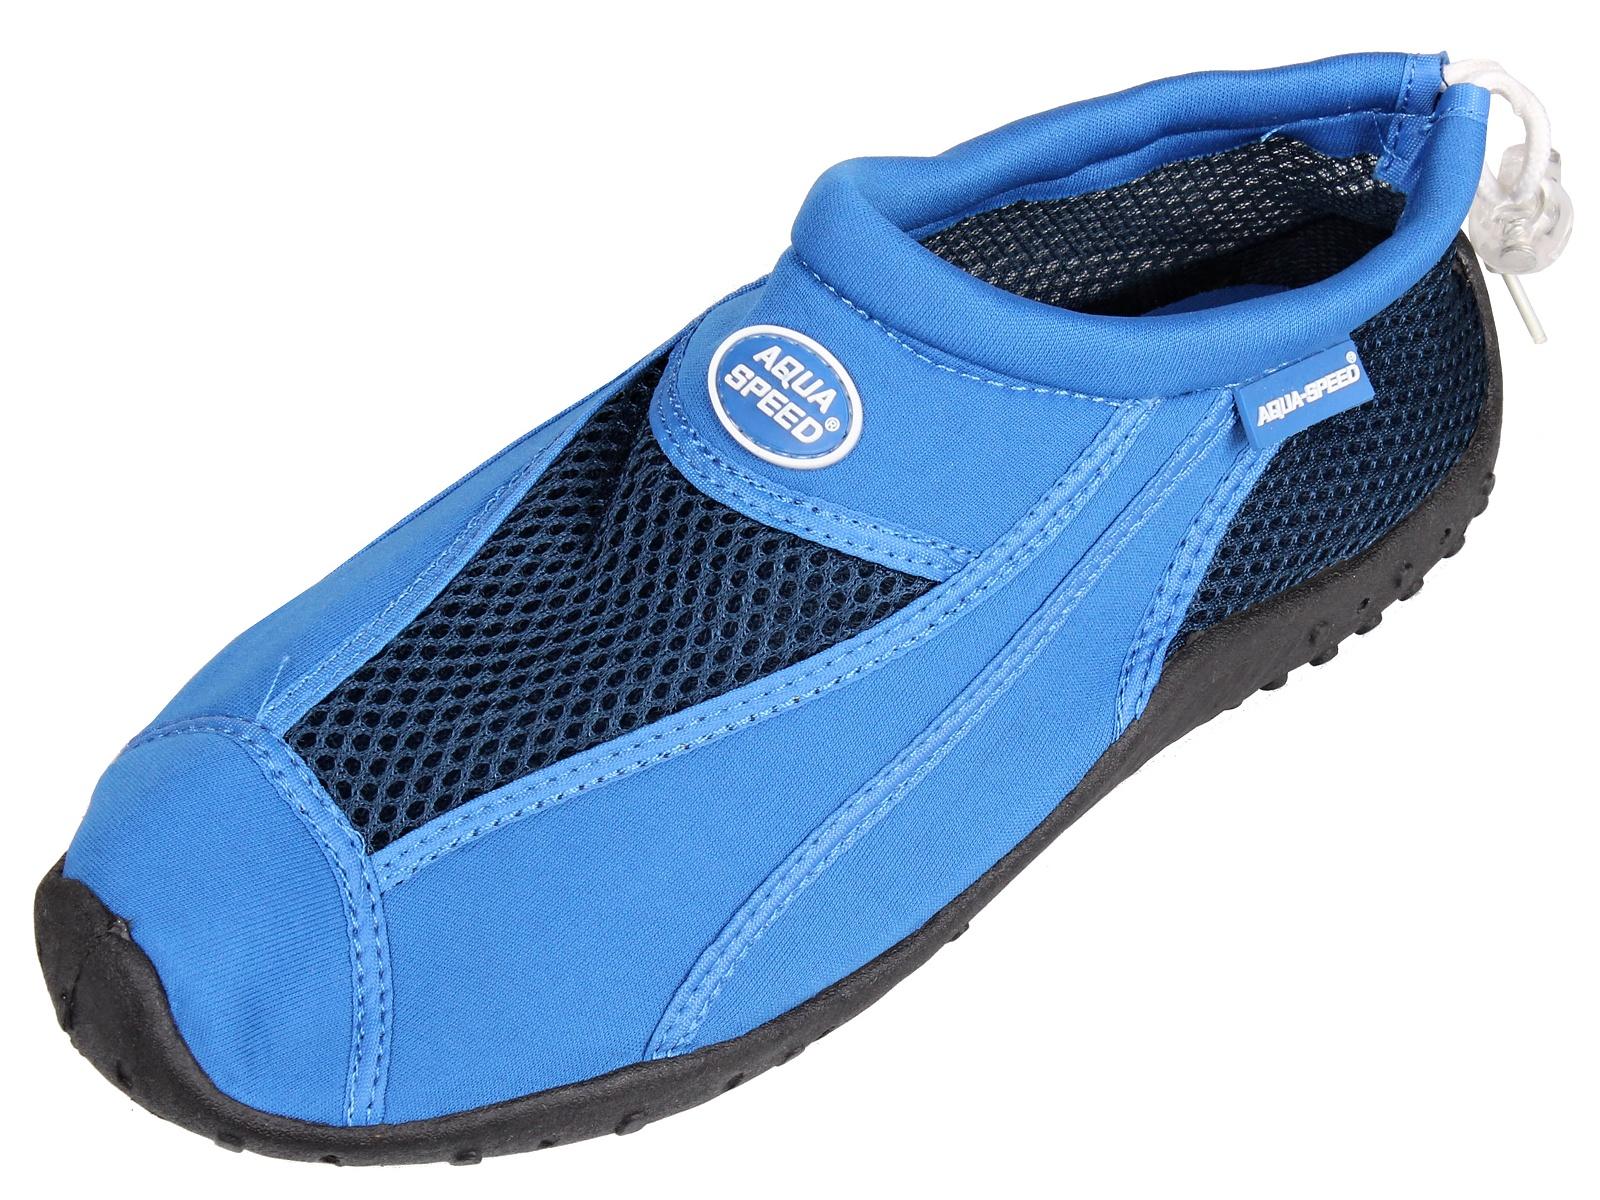 Boty do vody AQUA-SPEED 8 modré - vel. 40